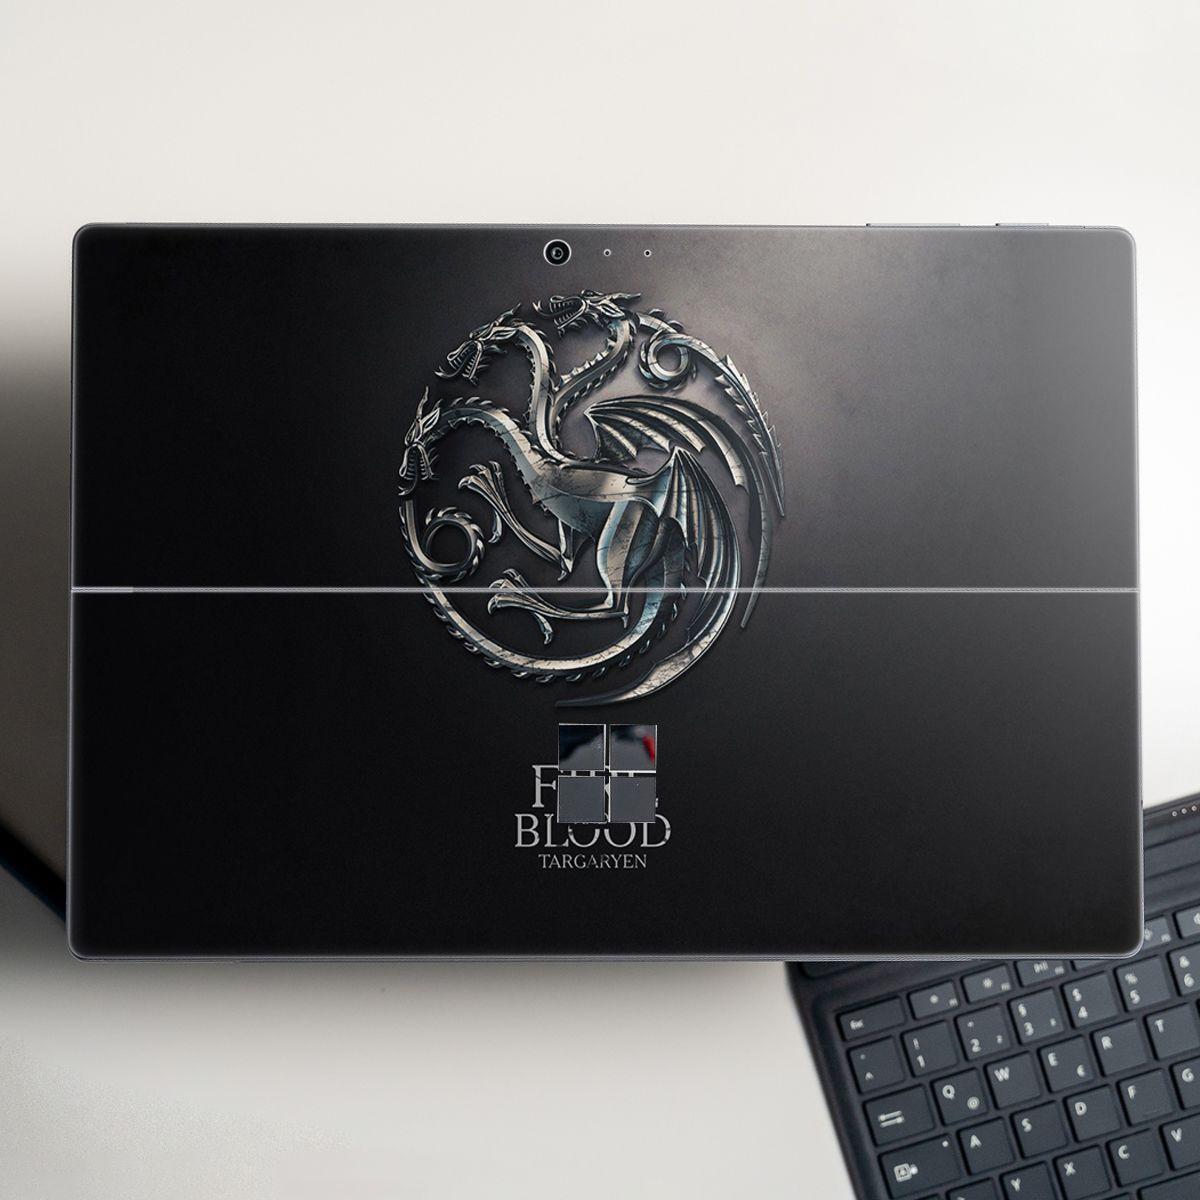 Skin dán hình Game of Thrones cho Surface Go, Pro 2, Pro 3, Pro 4, Pro 5, Pro 6, Pro 7, Pro X - Mã: gotl21 - Surface Pro X